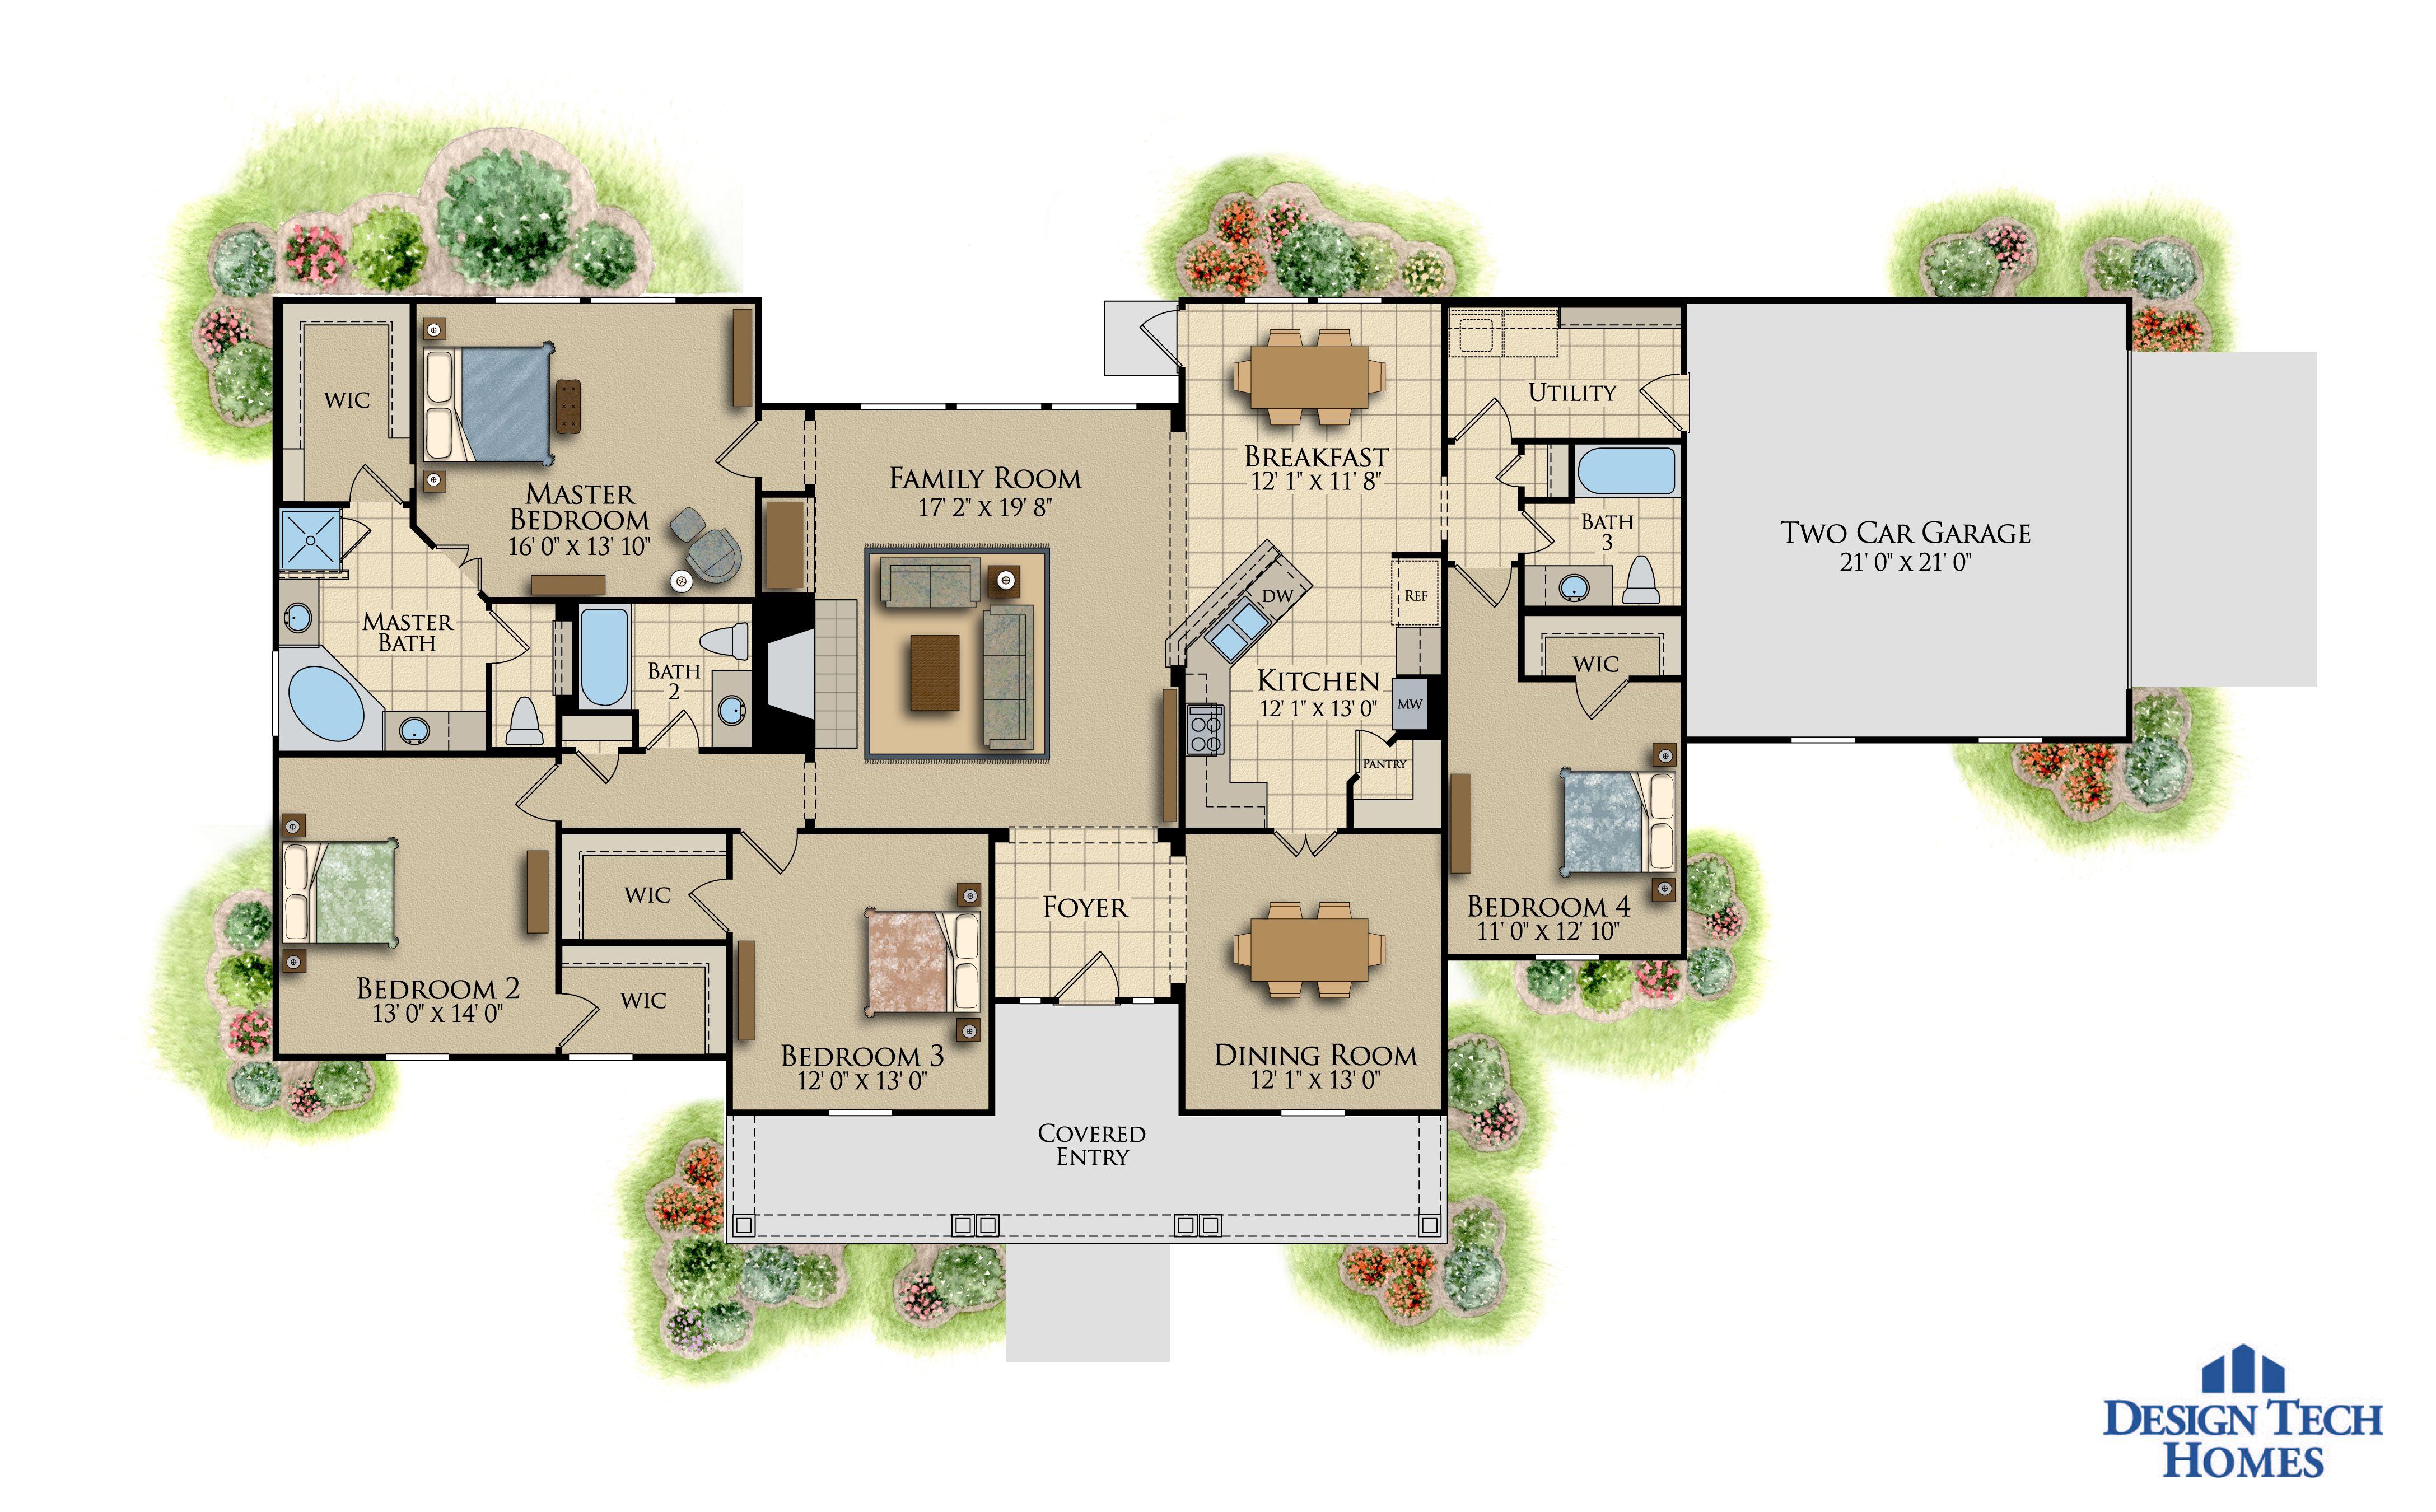 The Saddlebrook Design tech homes 2000 sq ft house